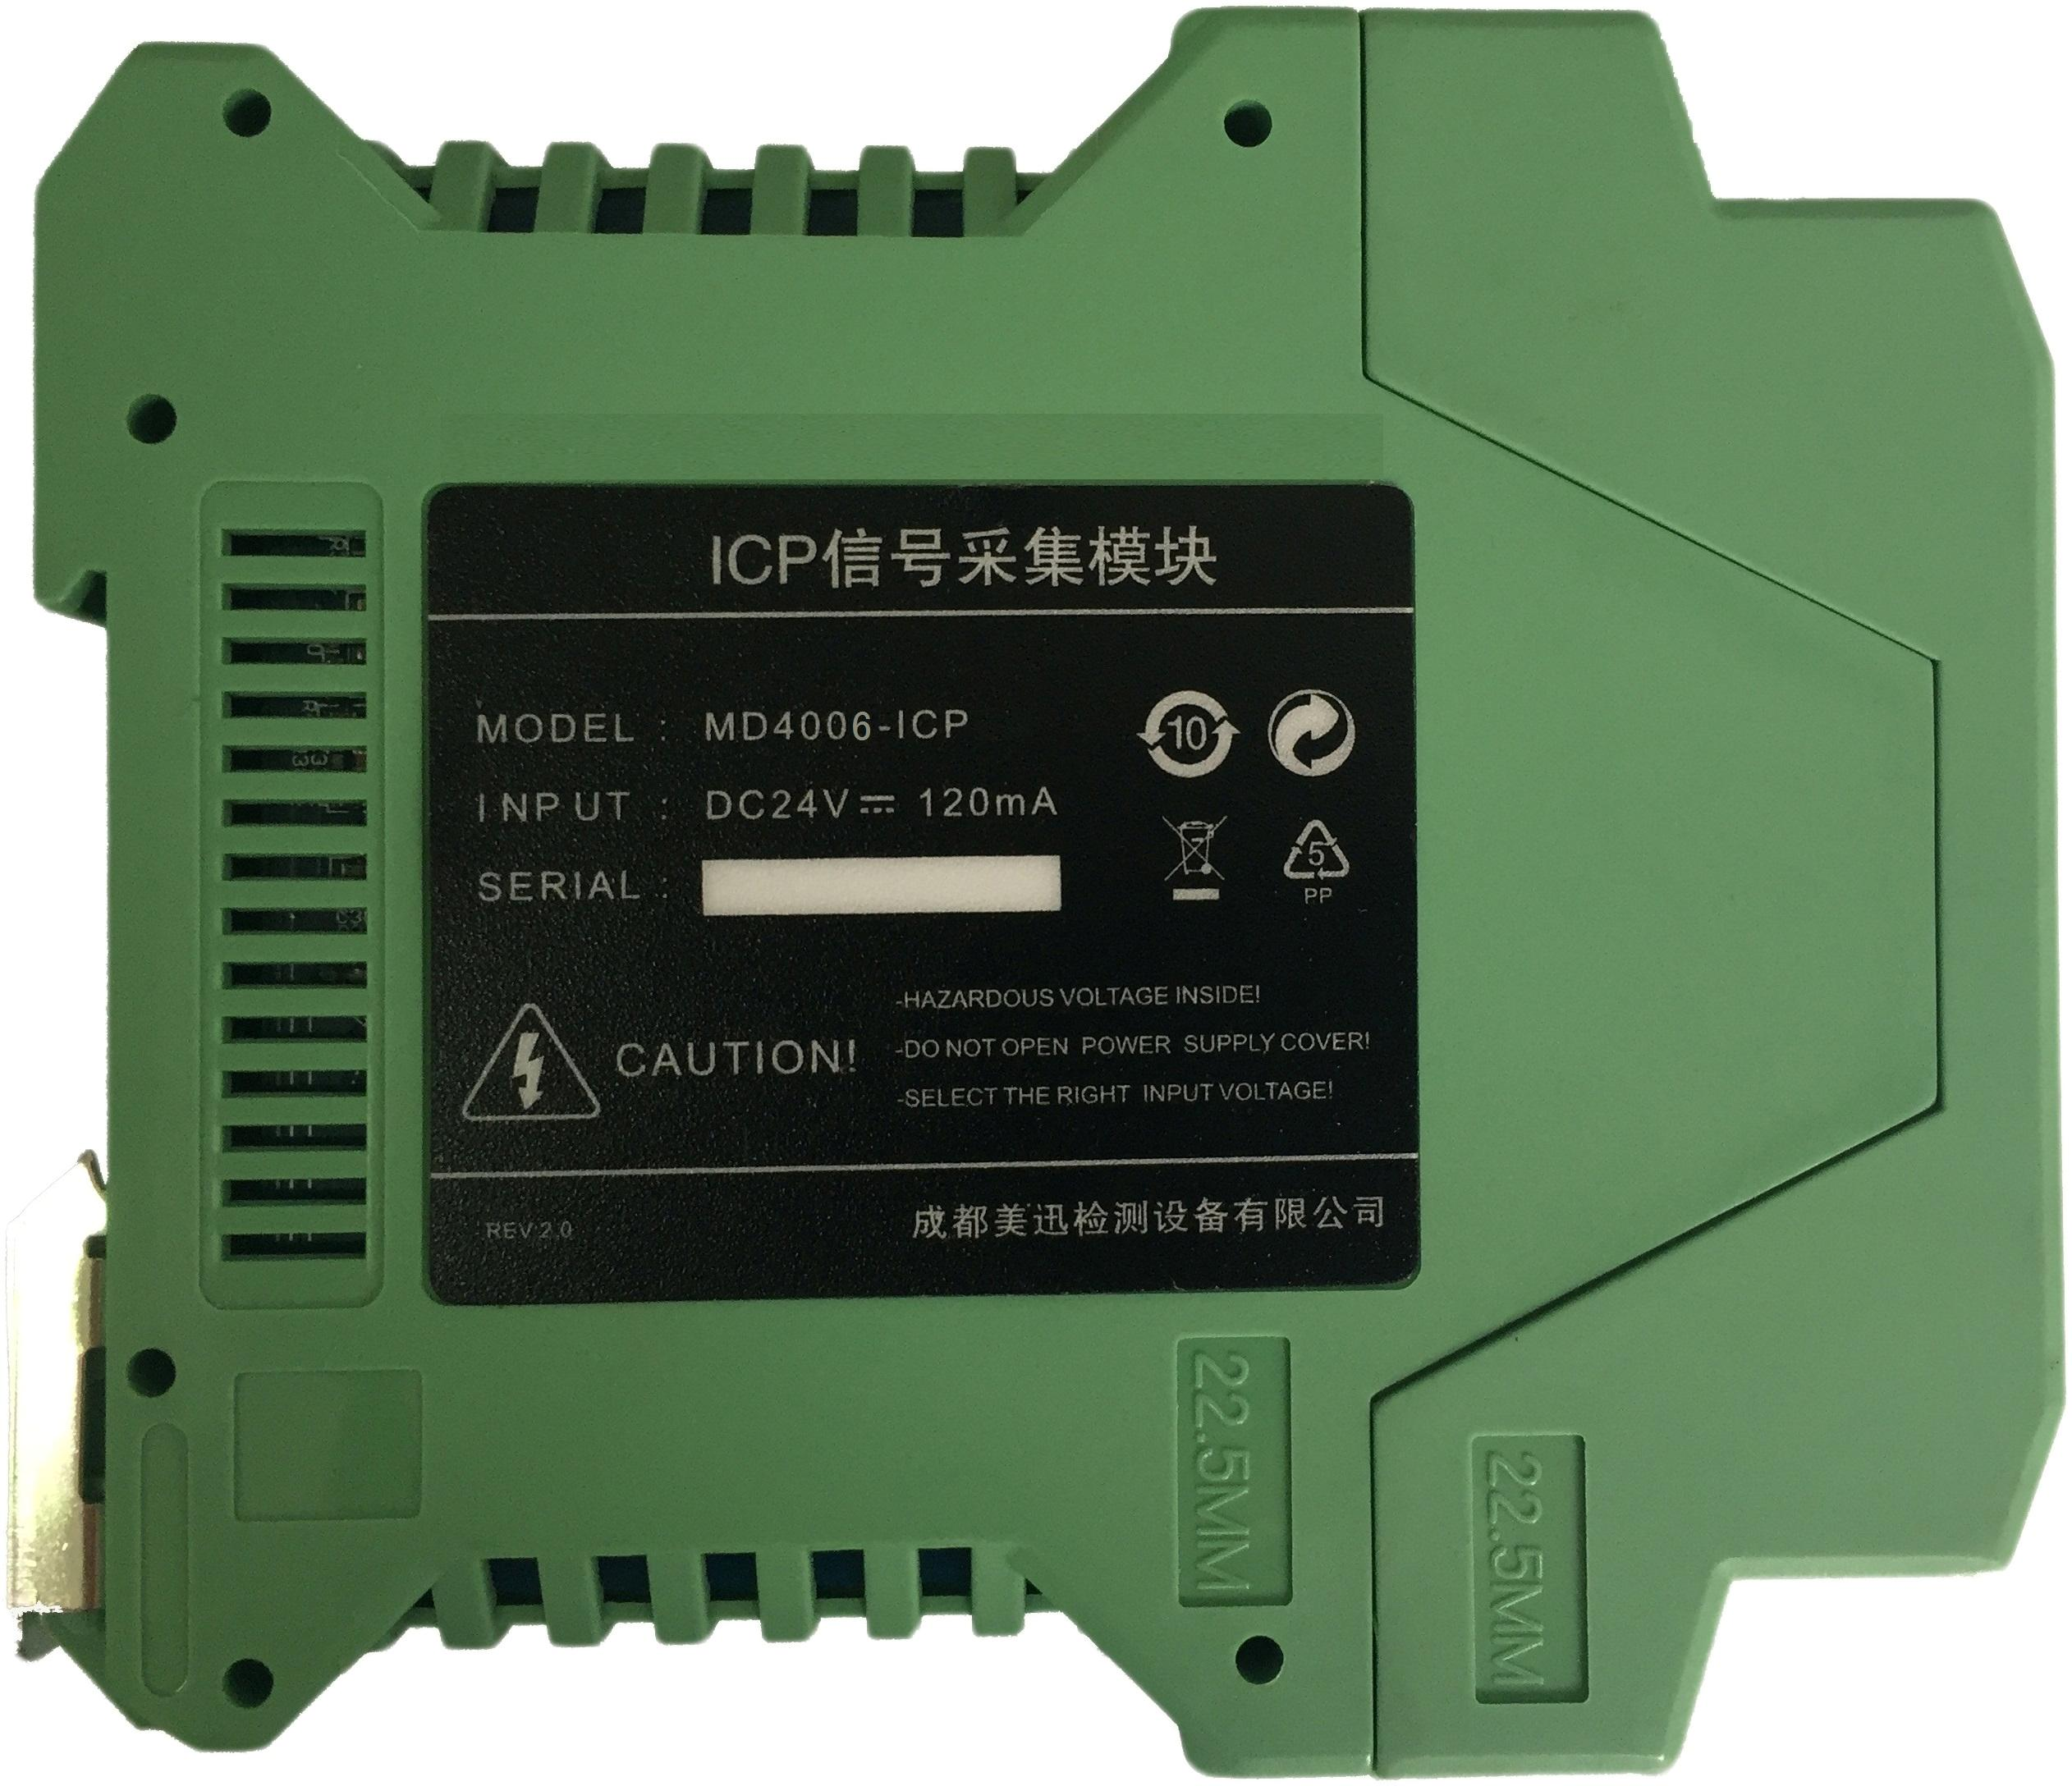 MD4006 ICP模块